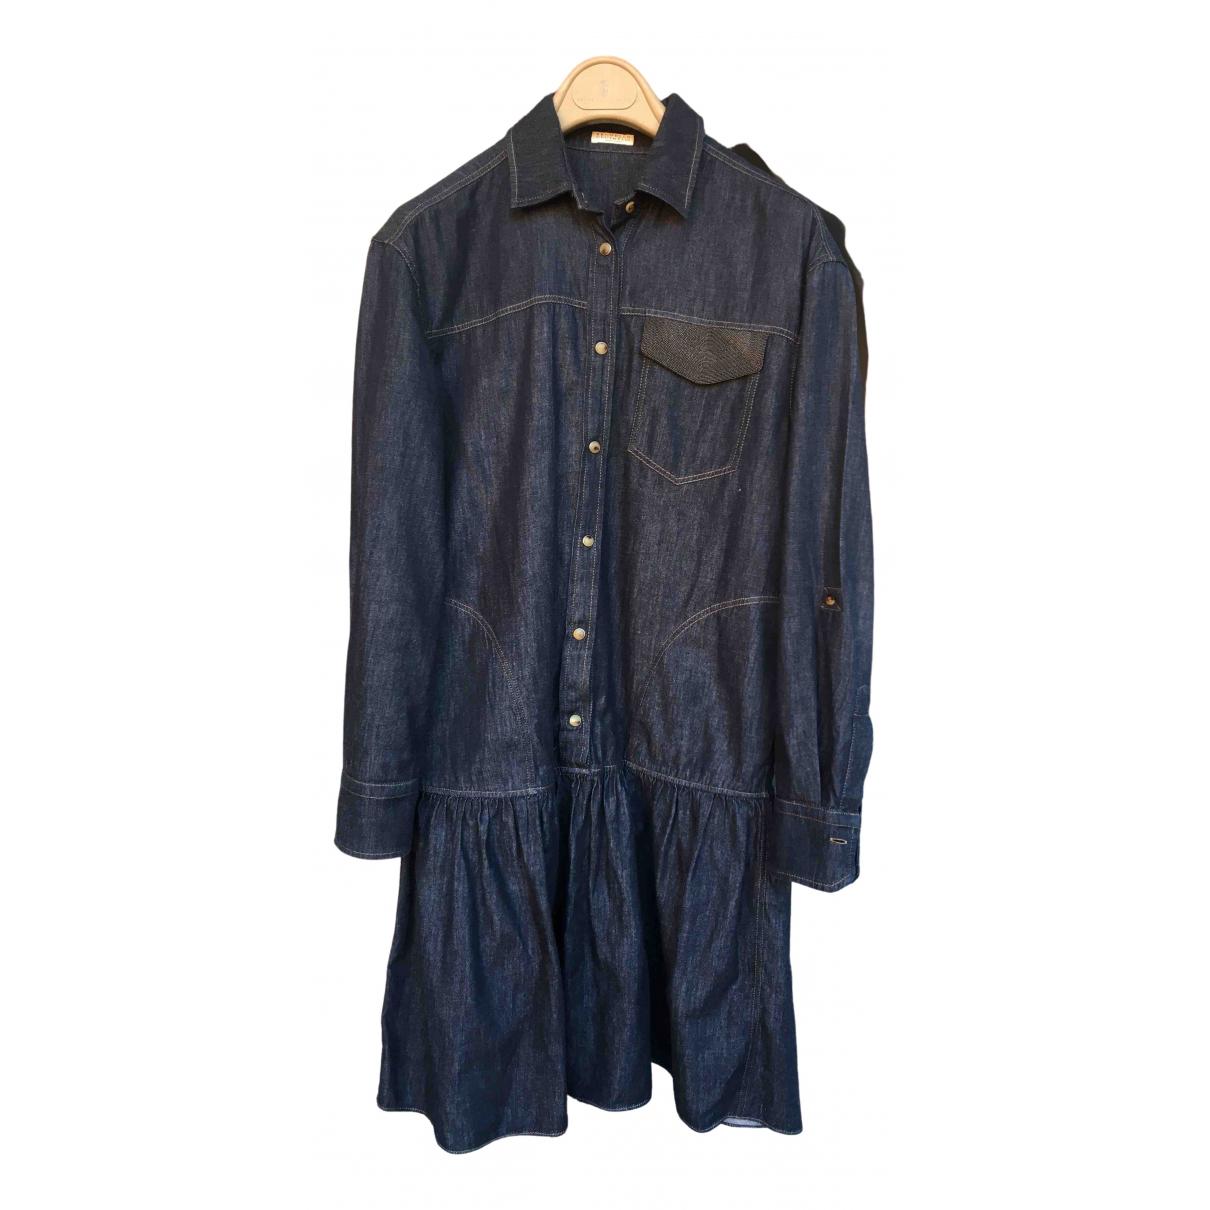 Brunello Cucinelli \N Blue Denim - Jeans dress for Women M International